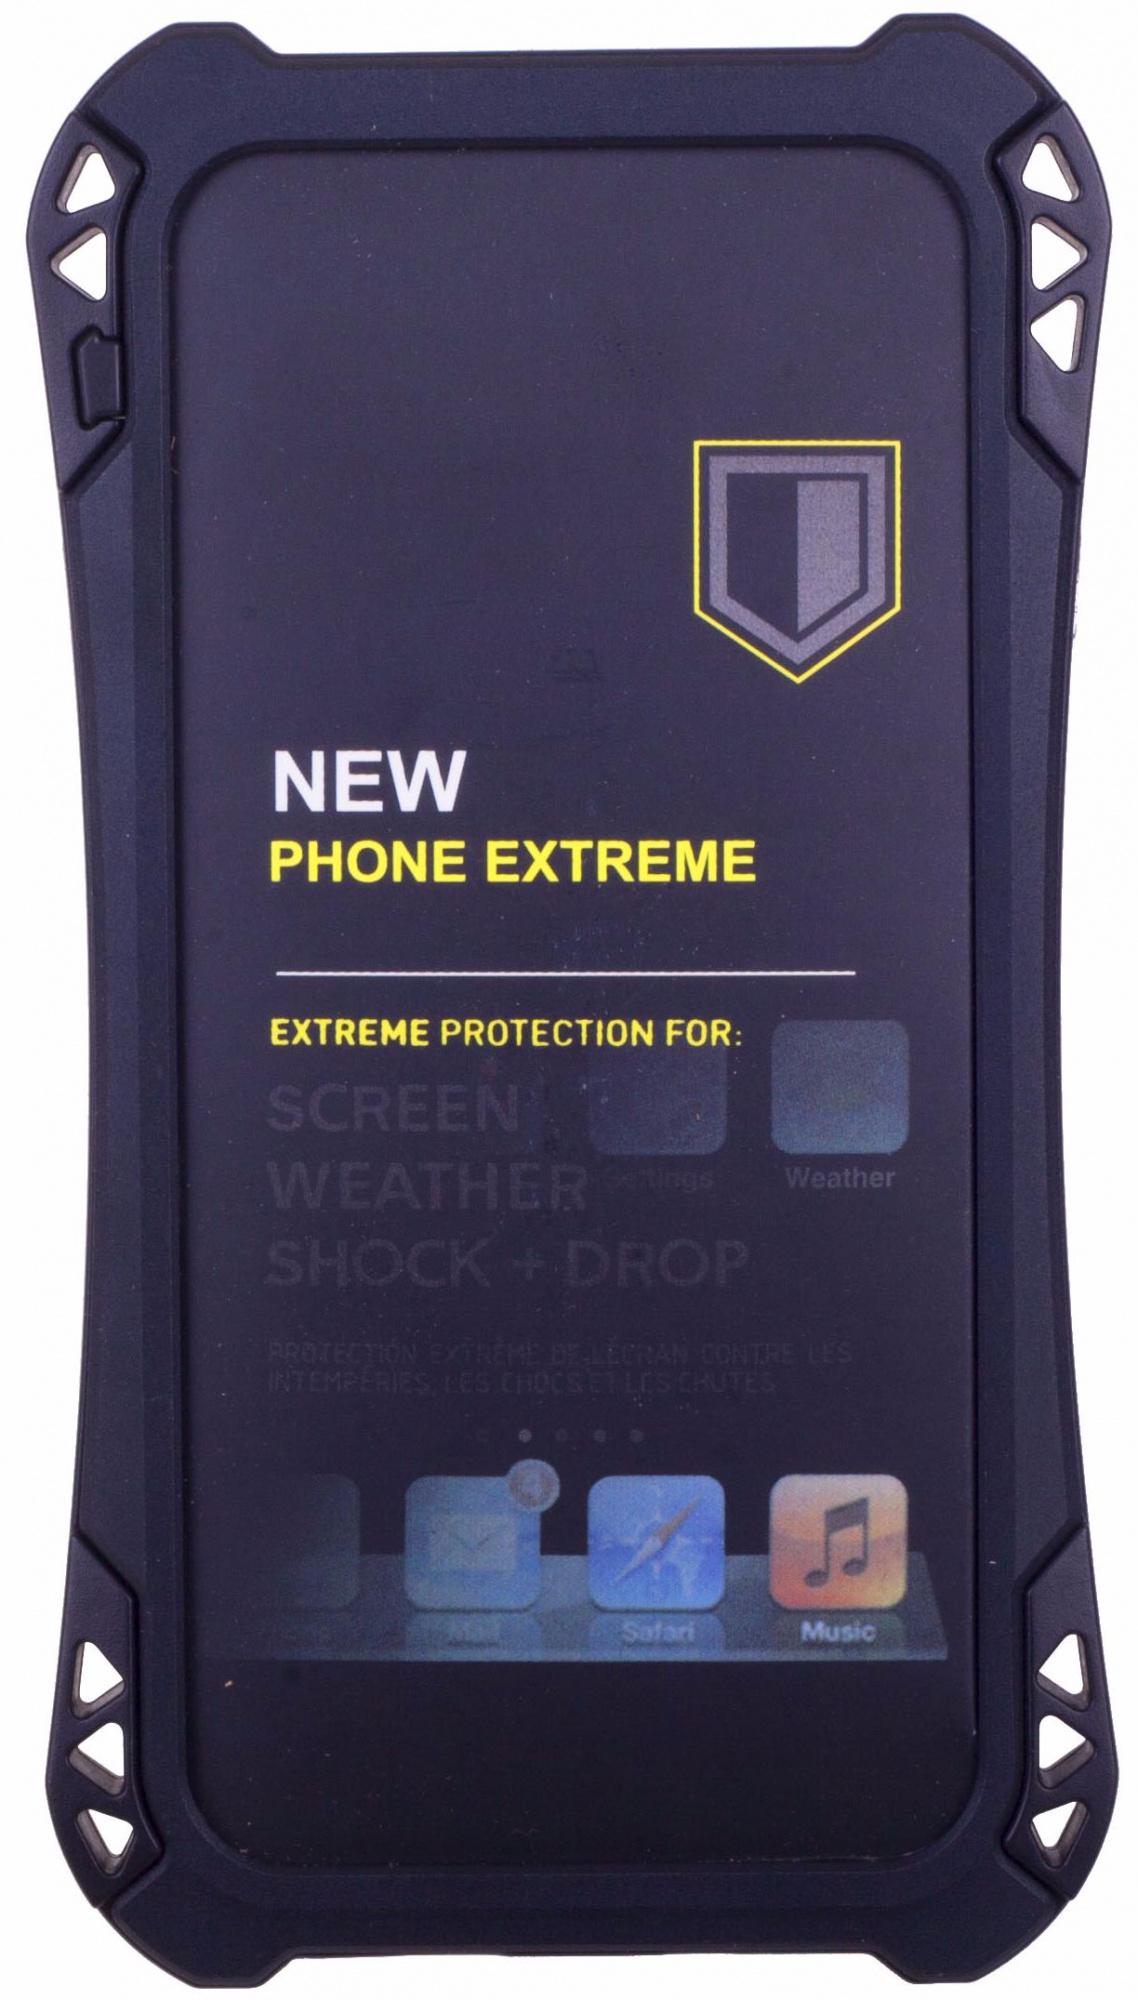 Phone Extreme